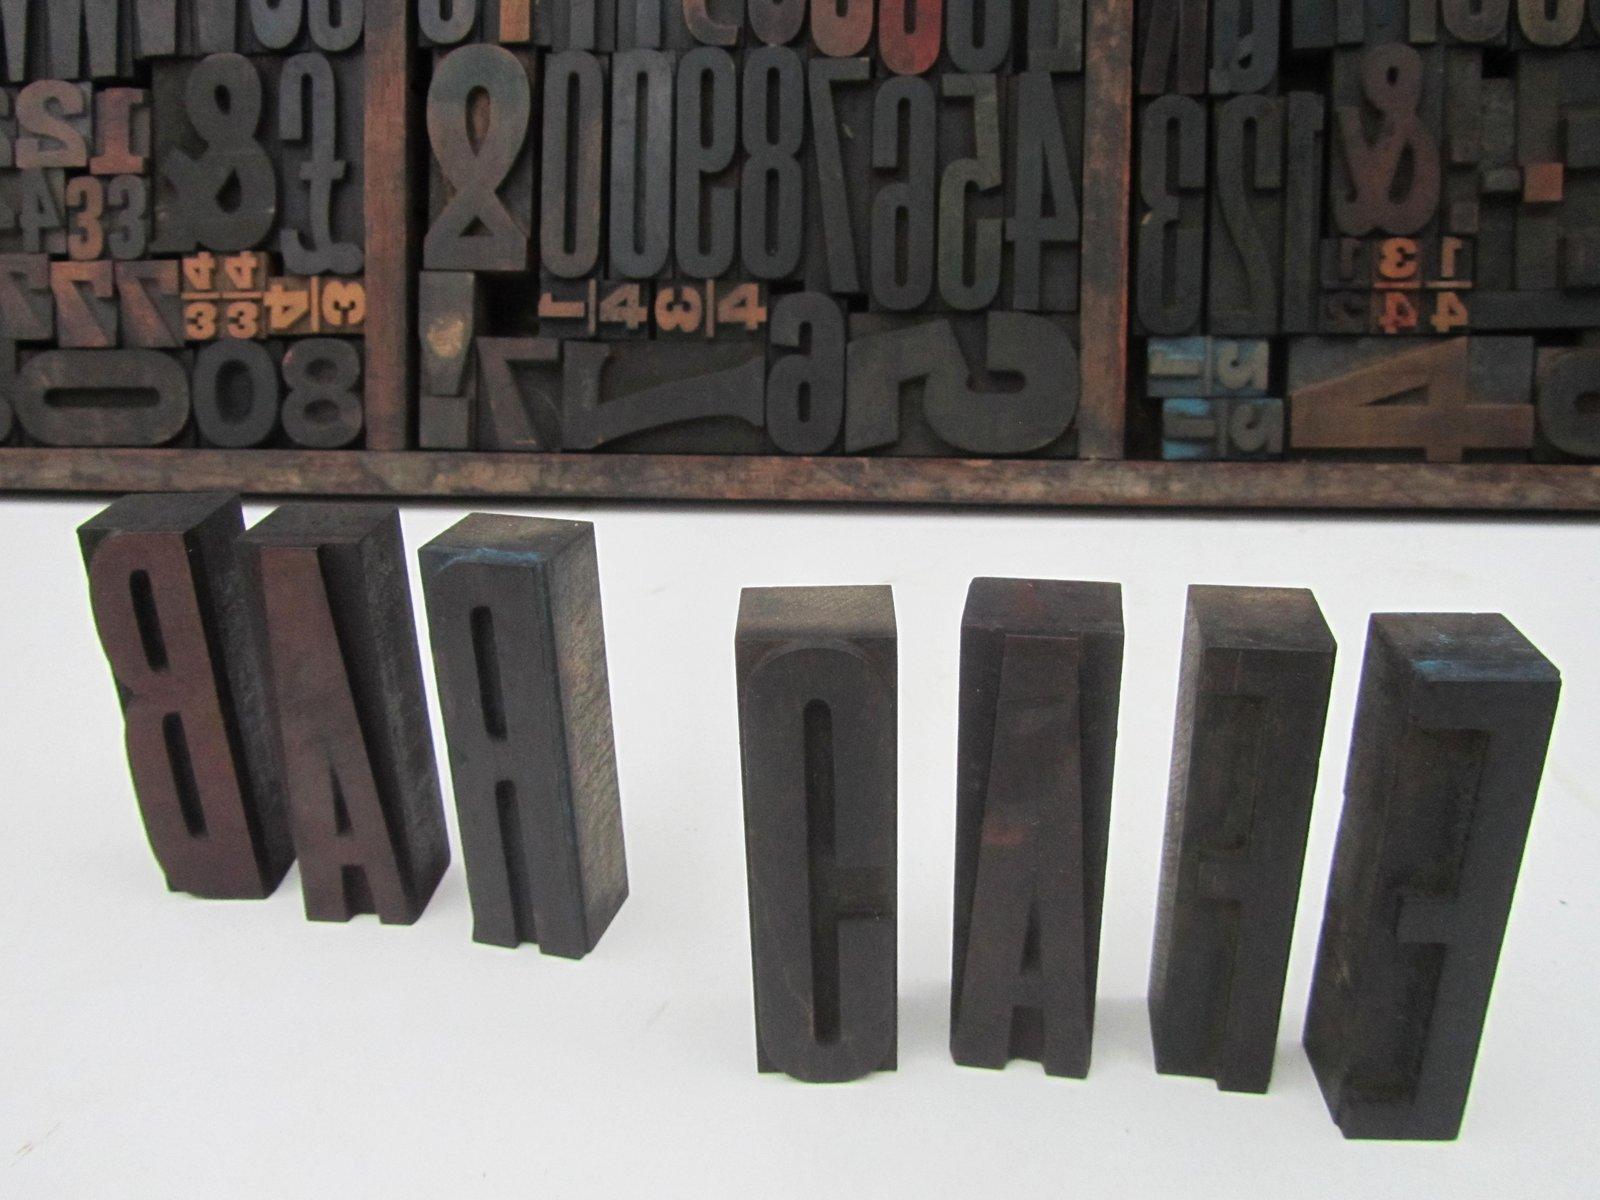 industrial vintage wooden letters numbers printing With wooden letters and numbers for sale